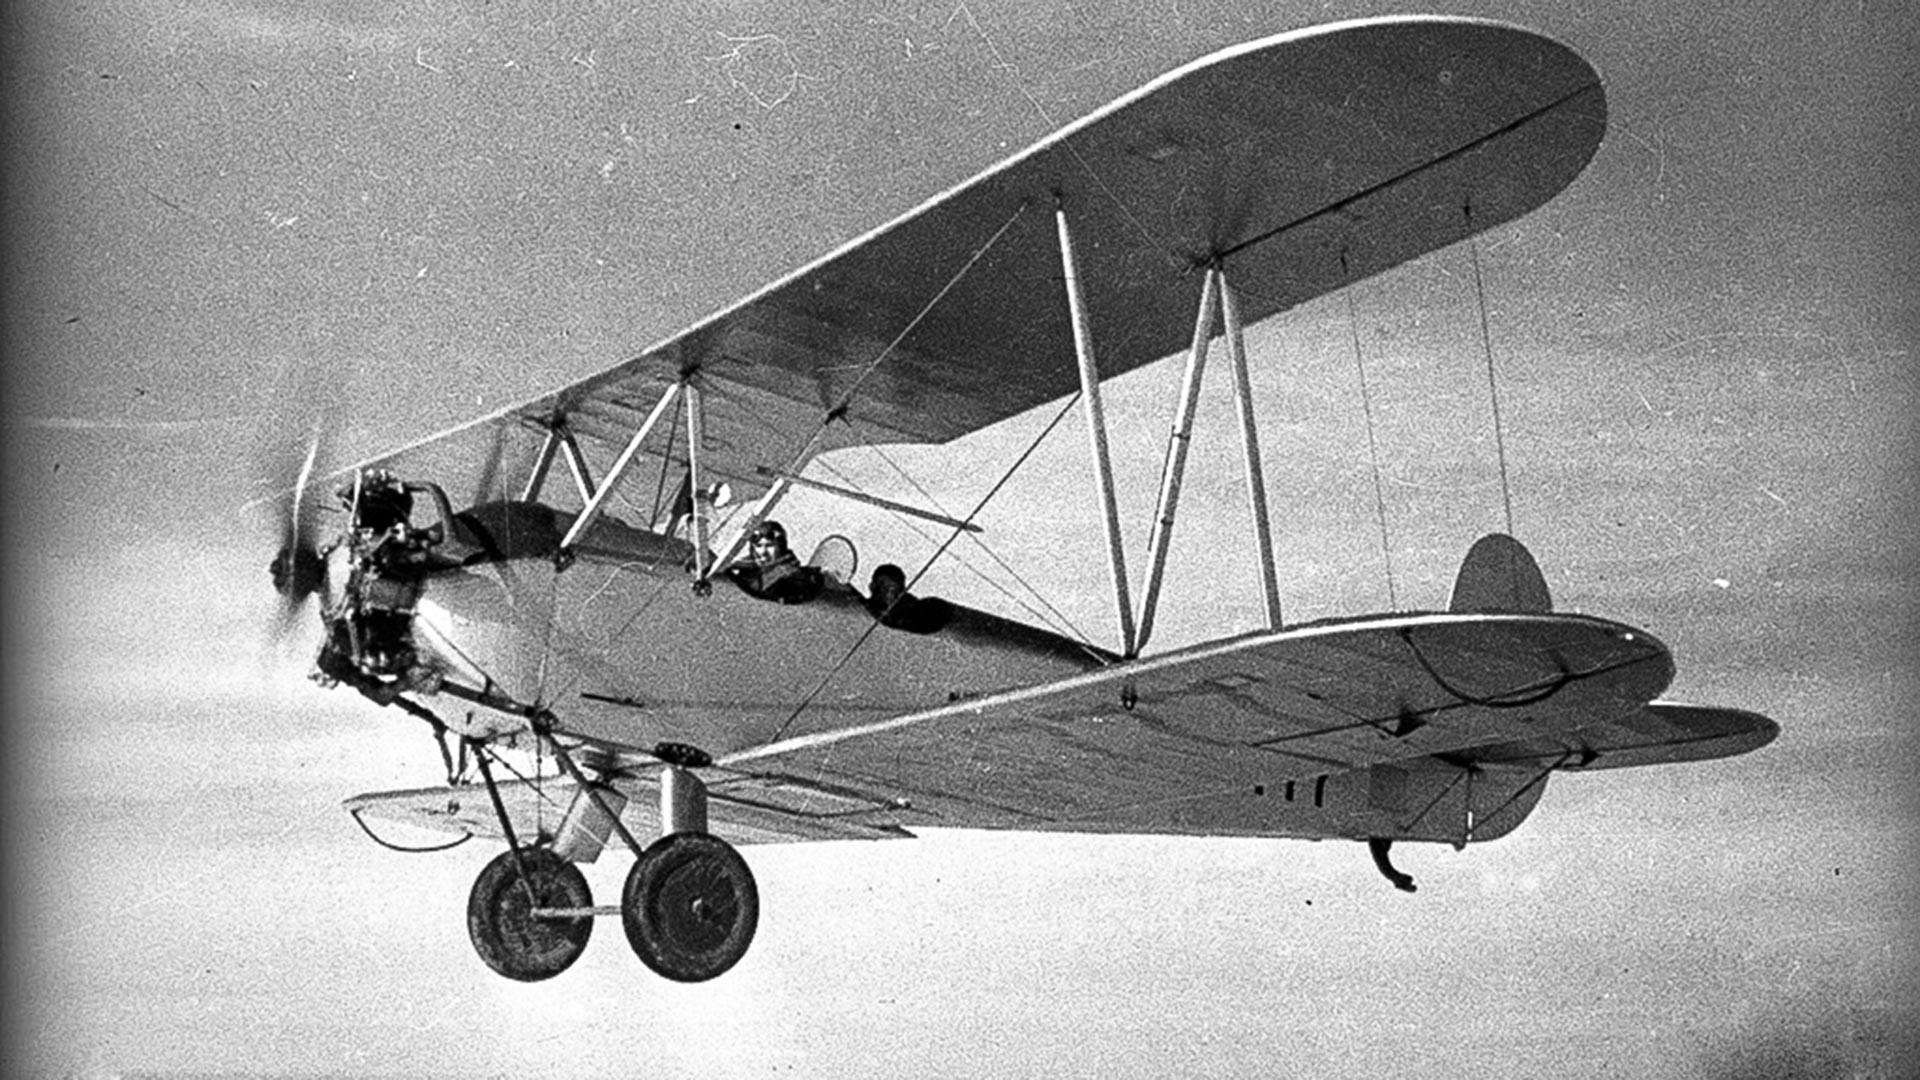 Поликарпов По-2 (до 1944. носио назив У-2).